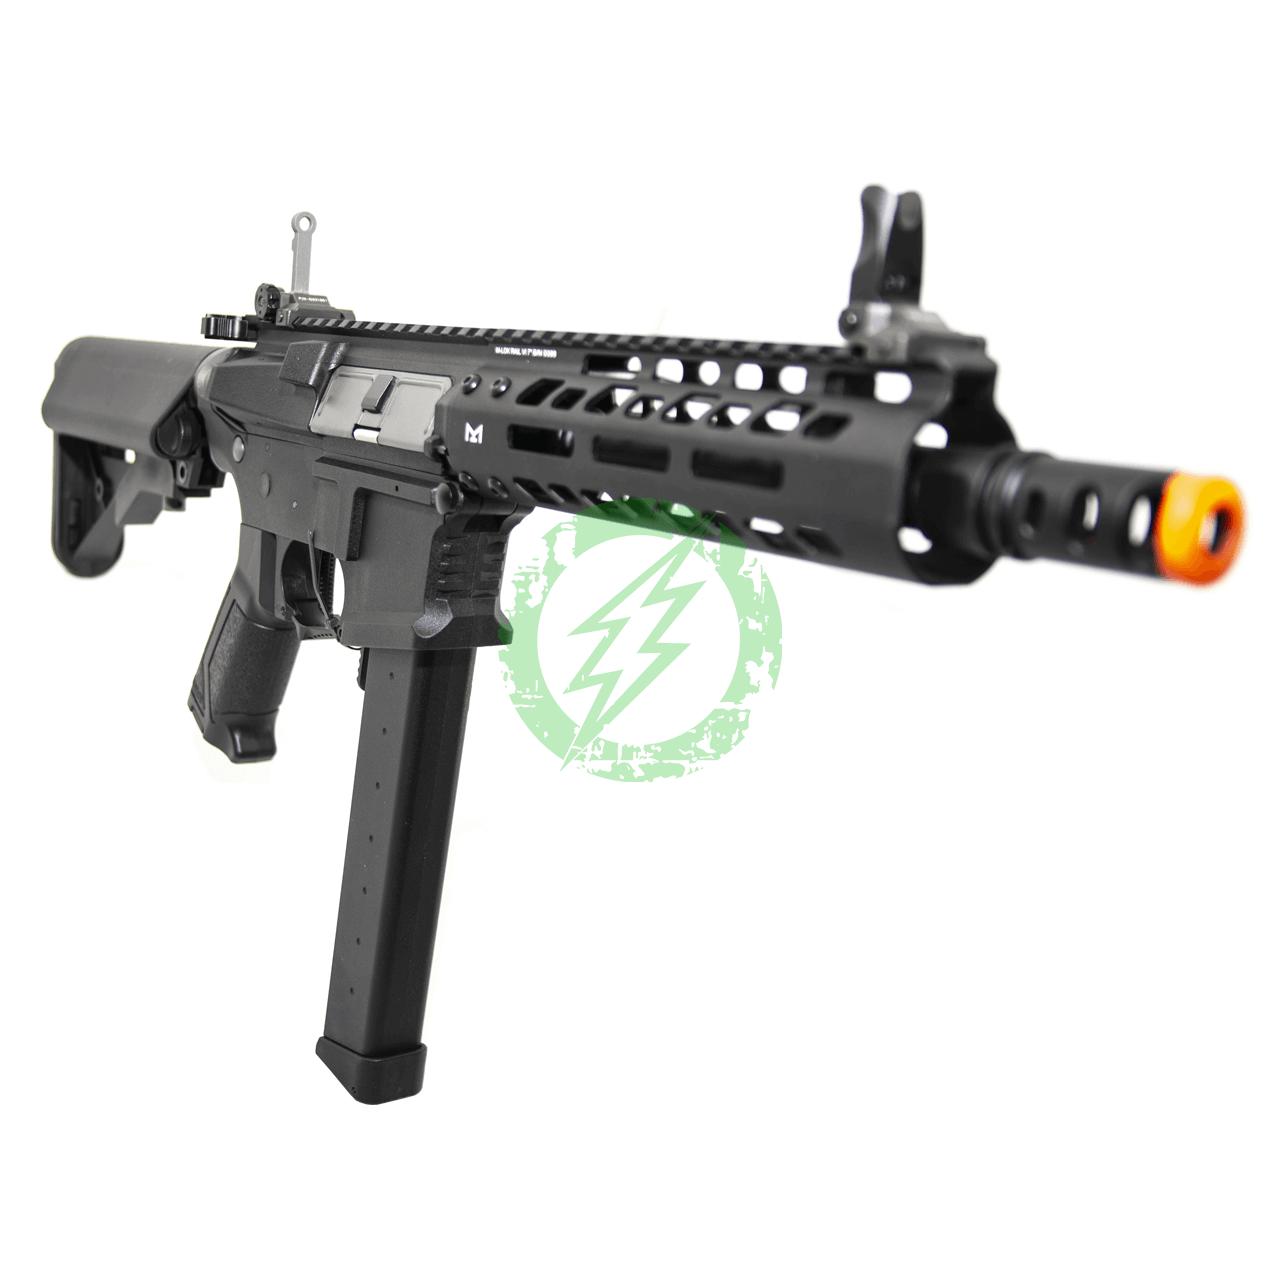 G&G PCC 9mm CQB Rifle | Black | Limited Edition